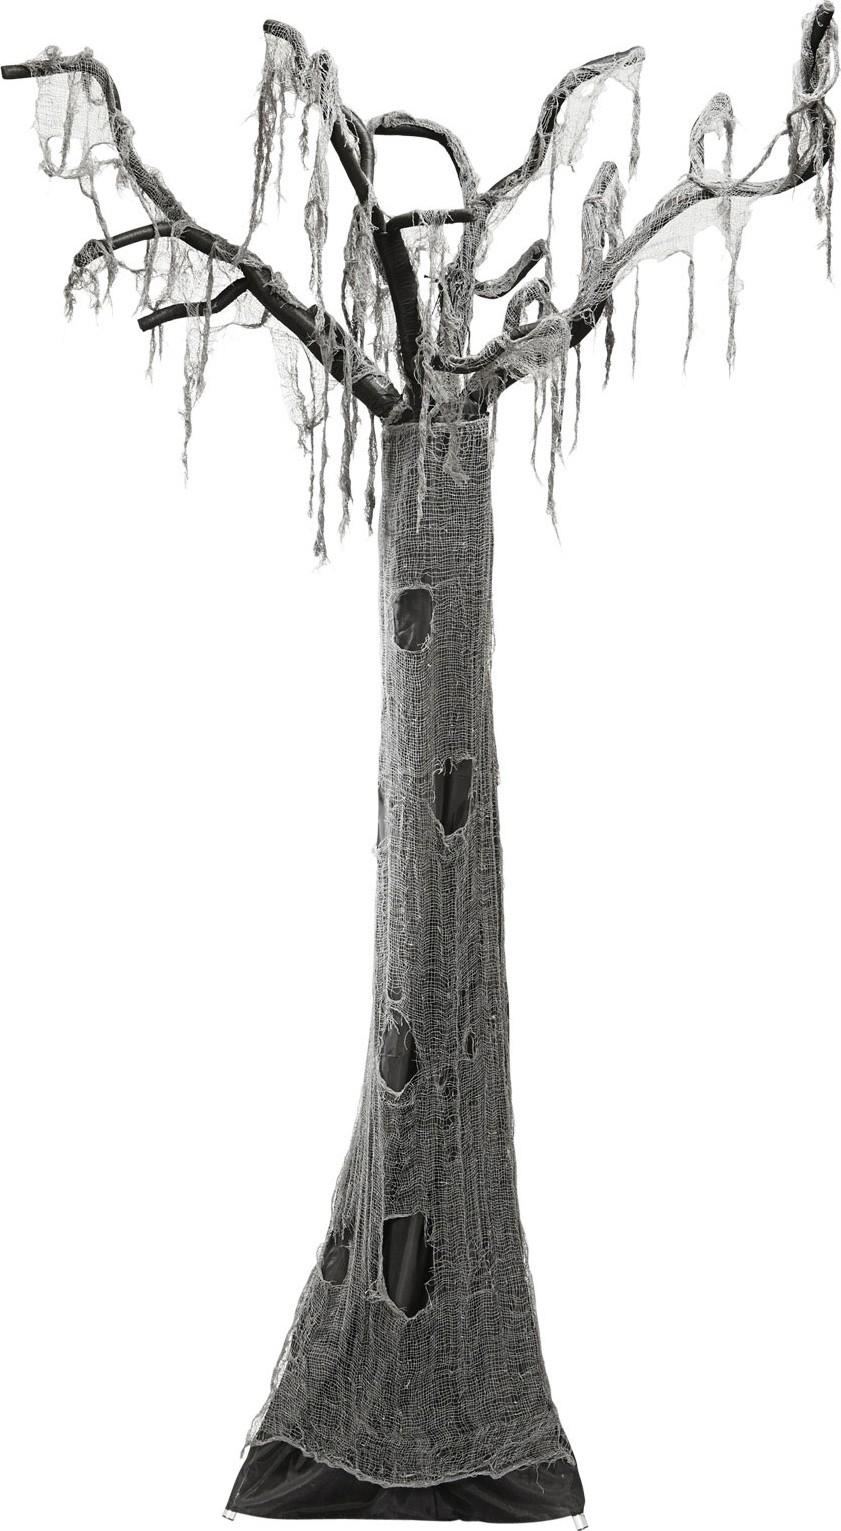 arbre g ant 280 cm suspendre halloween deguise toi achat de decoration animation. Black Bedroom Furniture Sets. Home Design Ideas